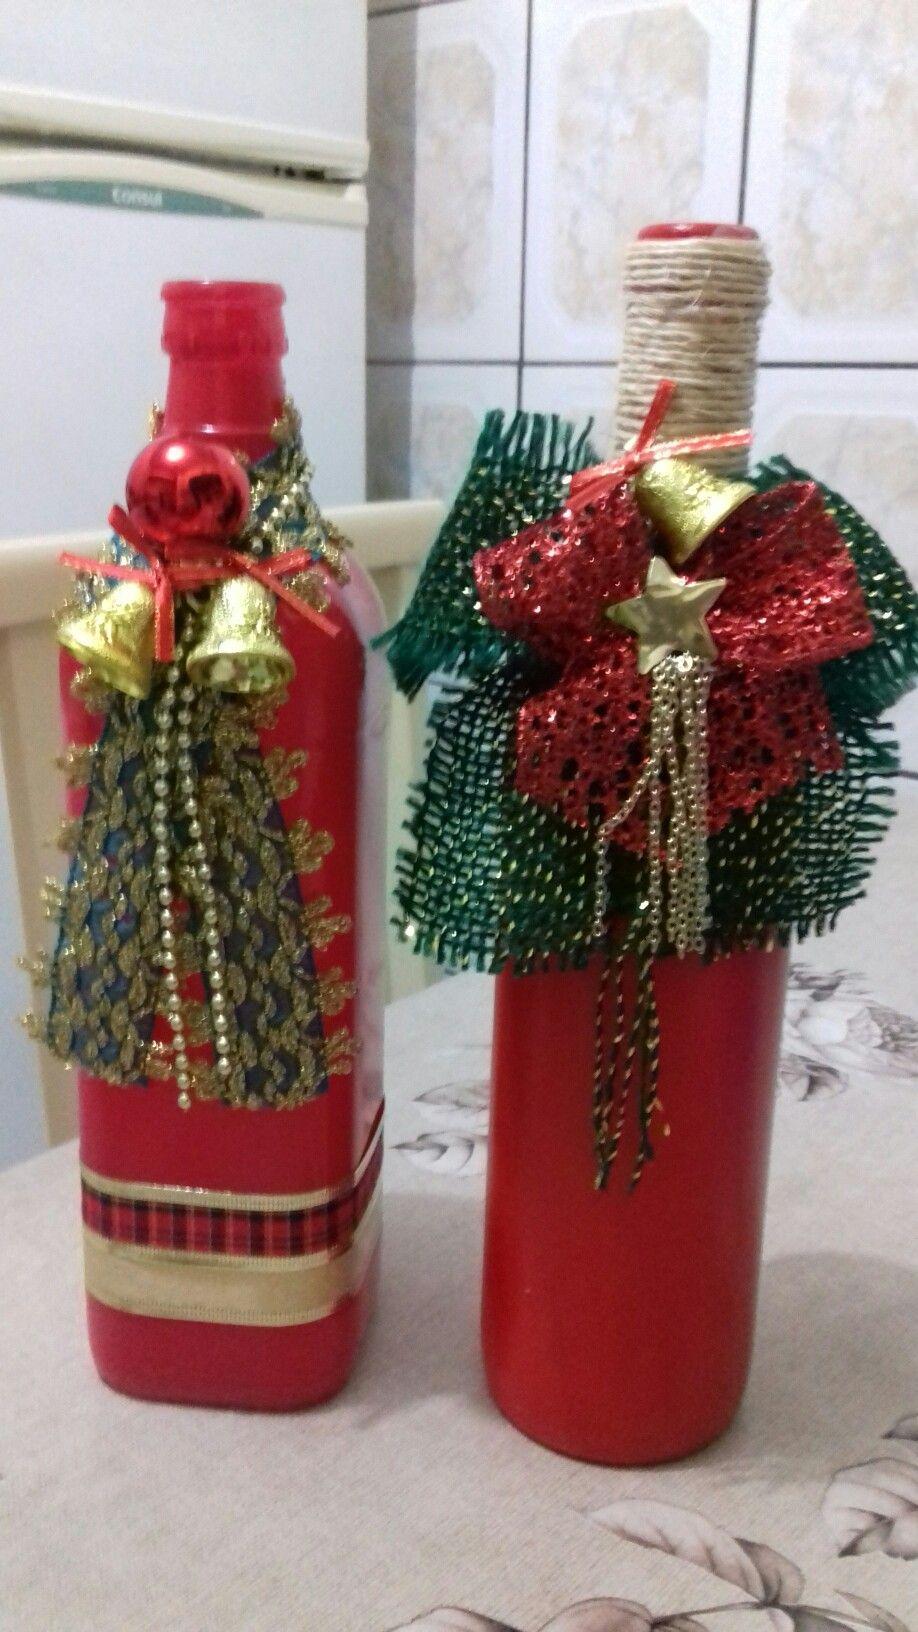 Pin by beth spicer on wine bottle crafts pinterest botellas botellas decoradas and navidad - Botellas decoradas navidenas ...